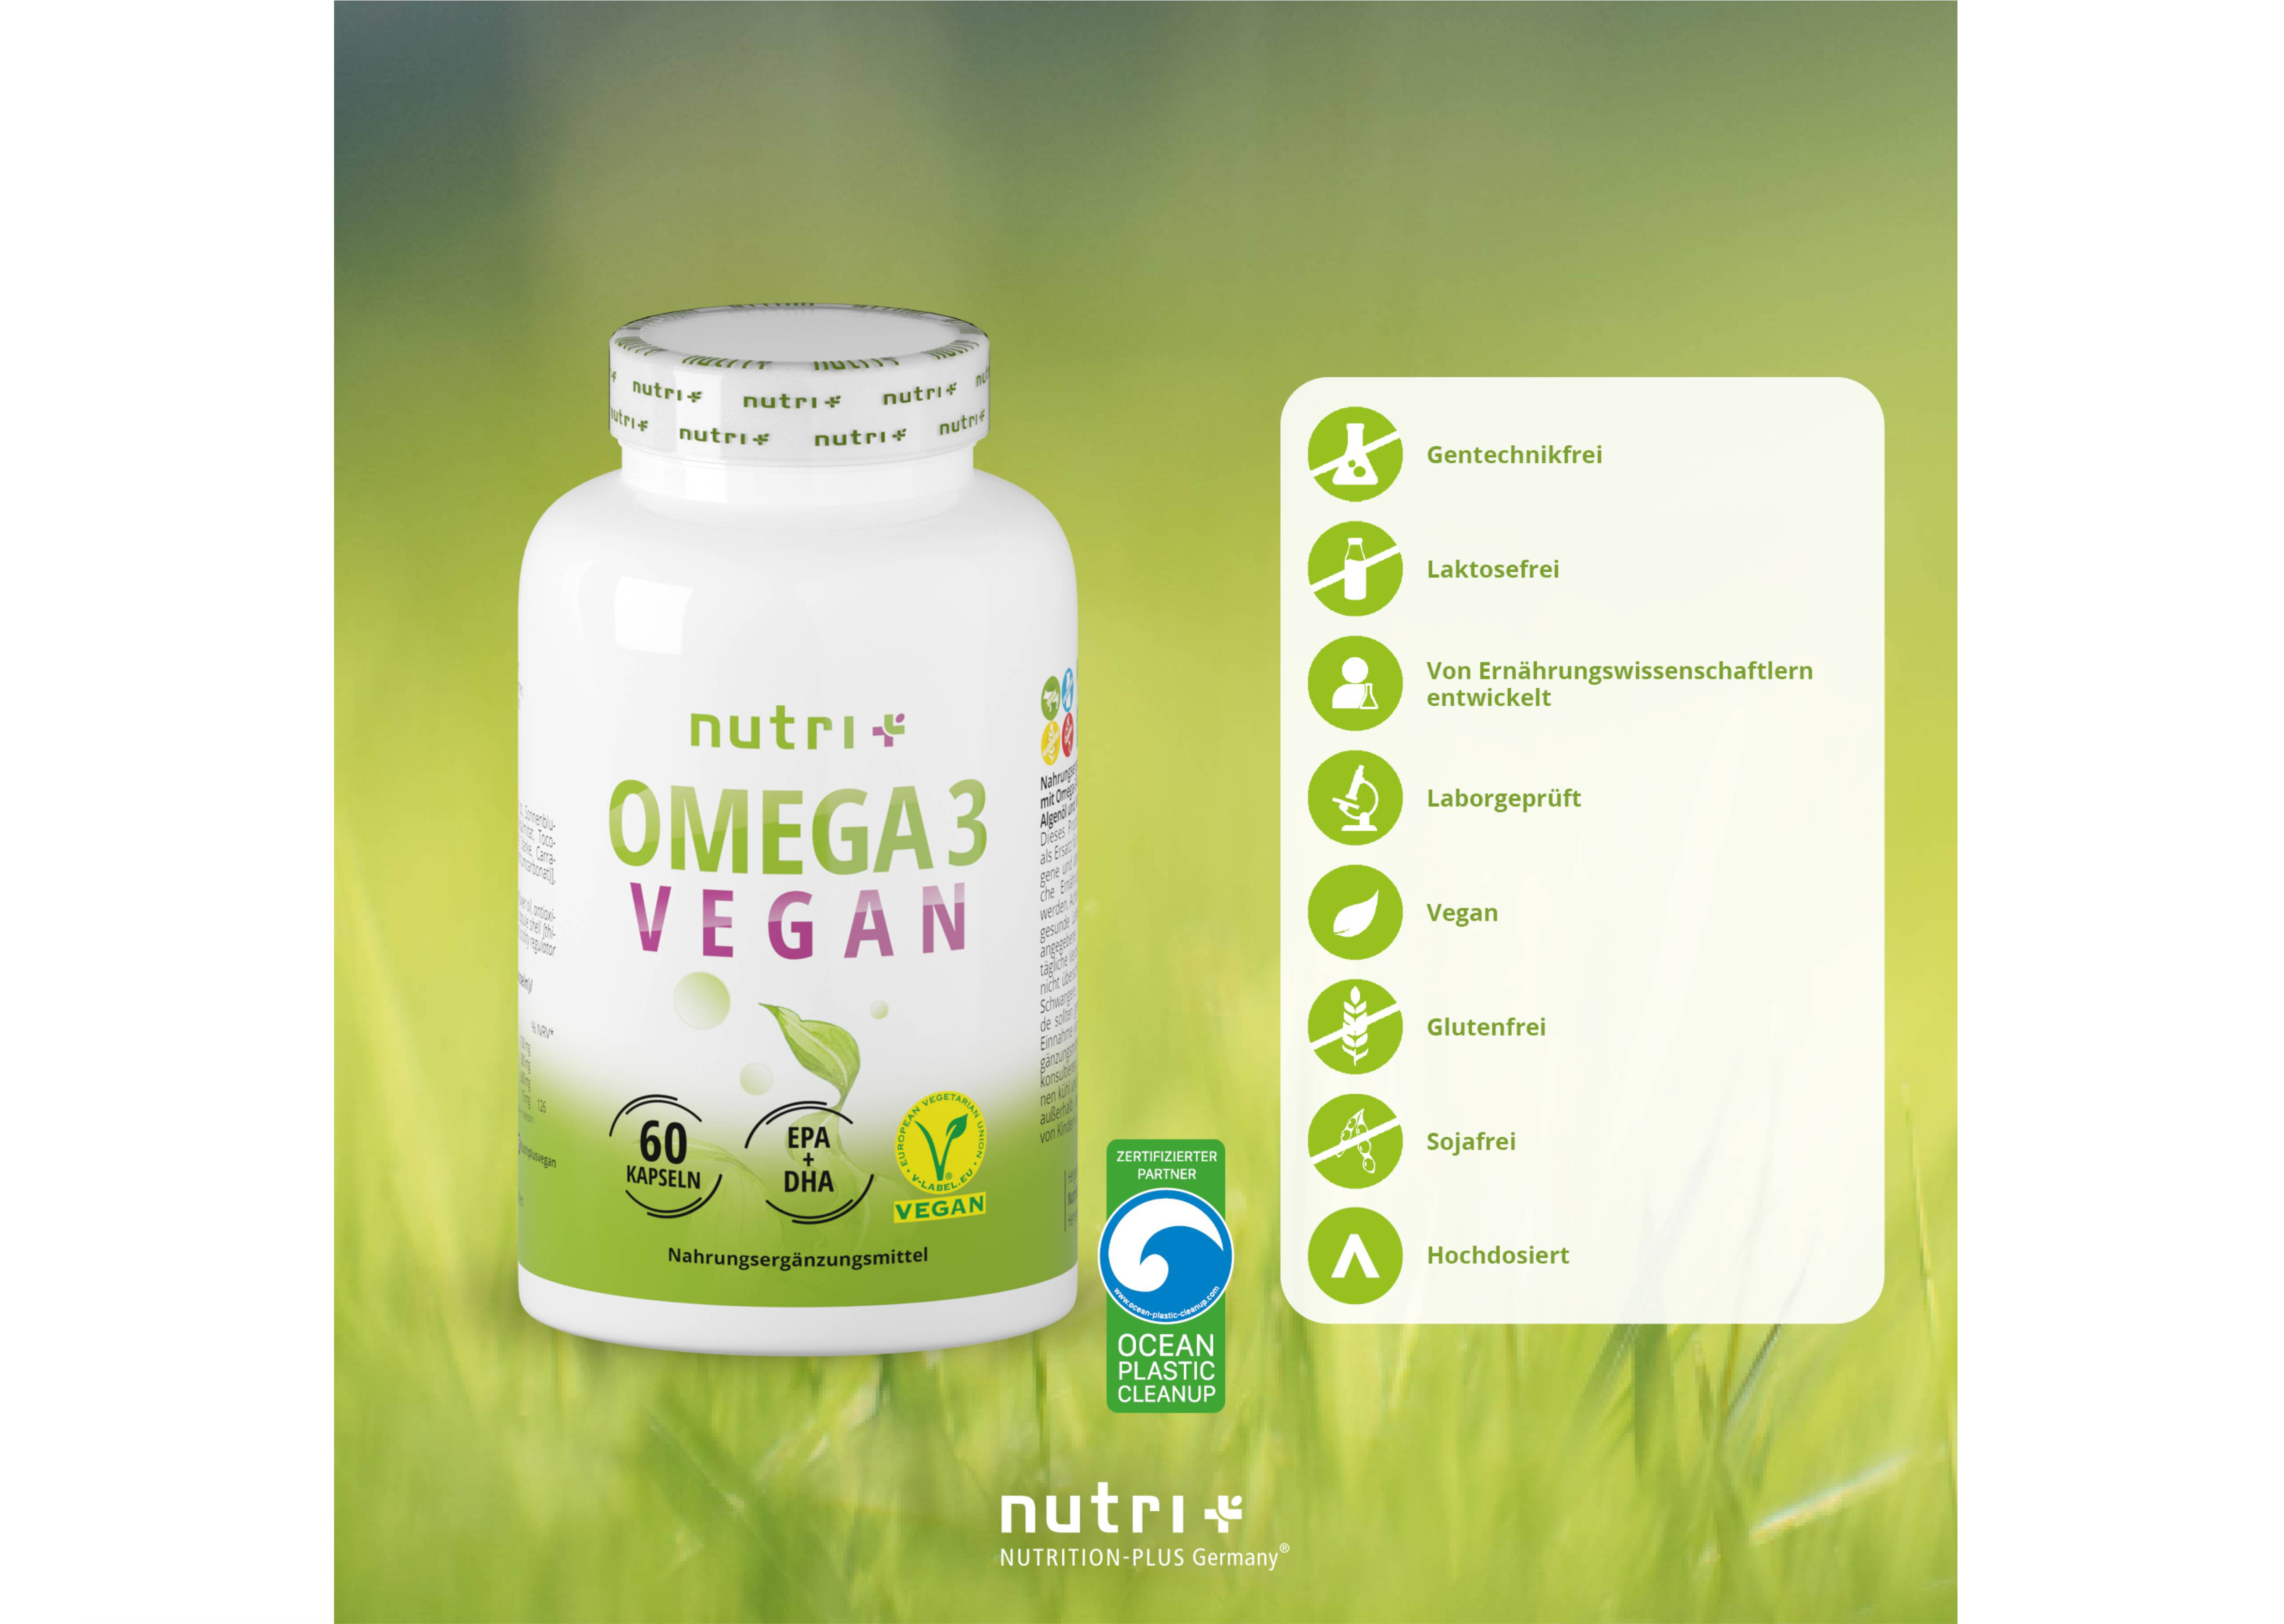 nutri+ Omega 3 Vegan - mit EPA + DHA